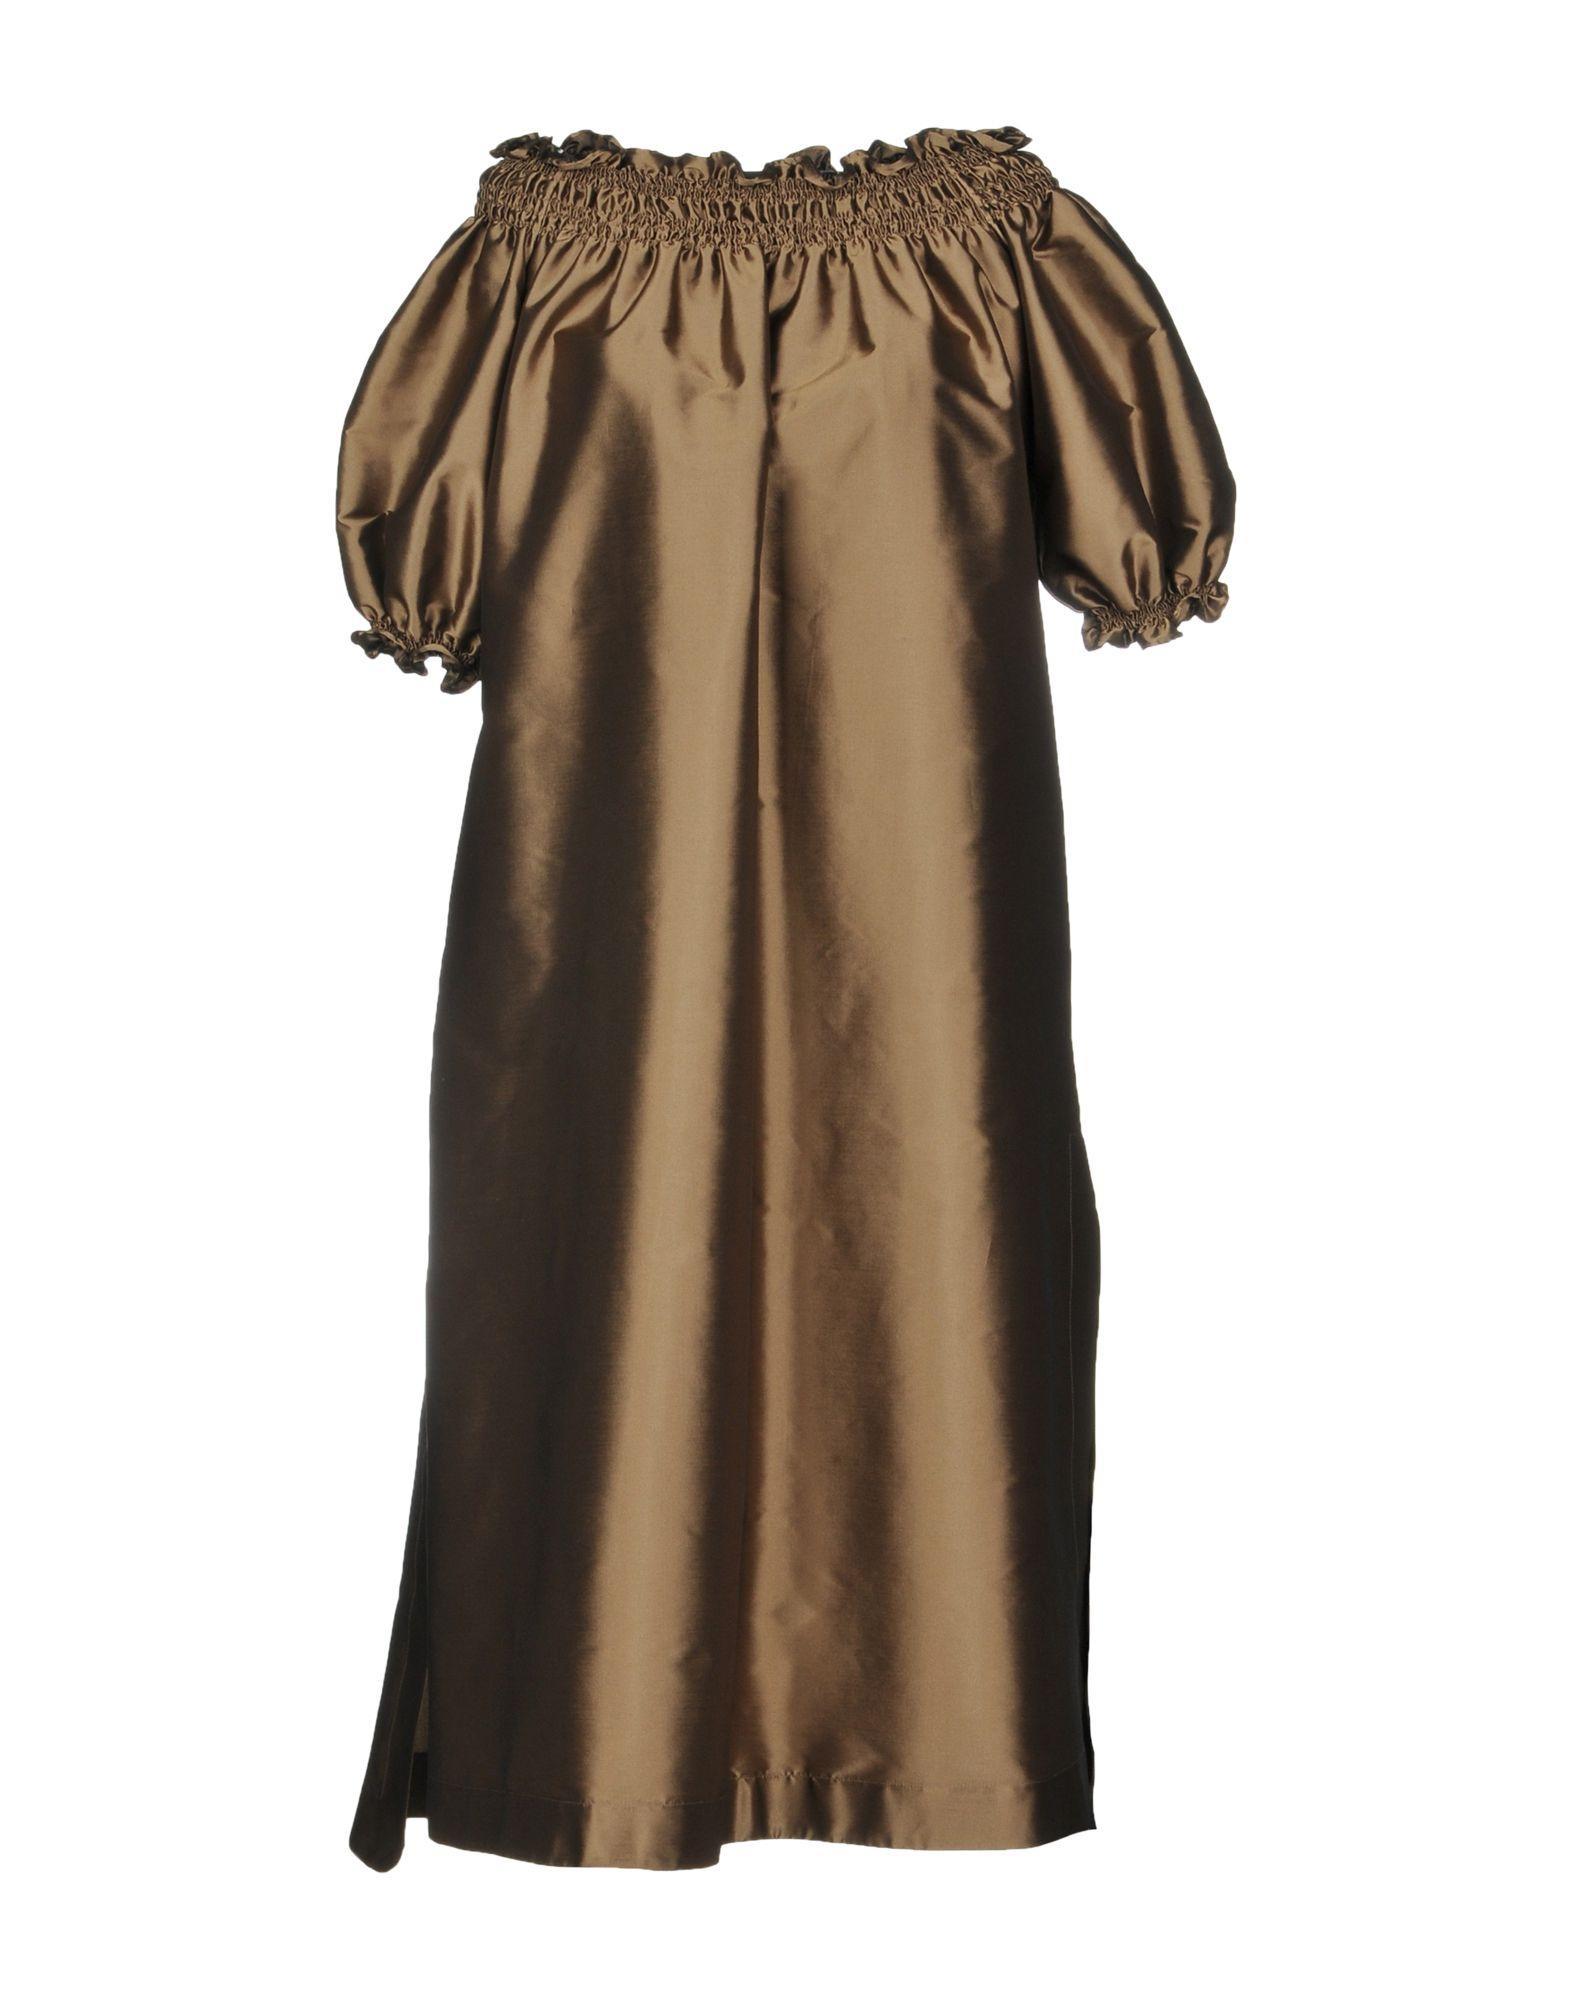 Rossella Jardini Knee-length Dress In Khaki